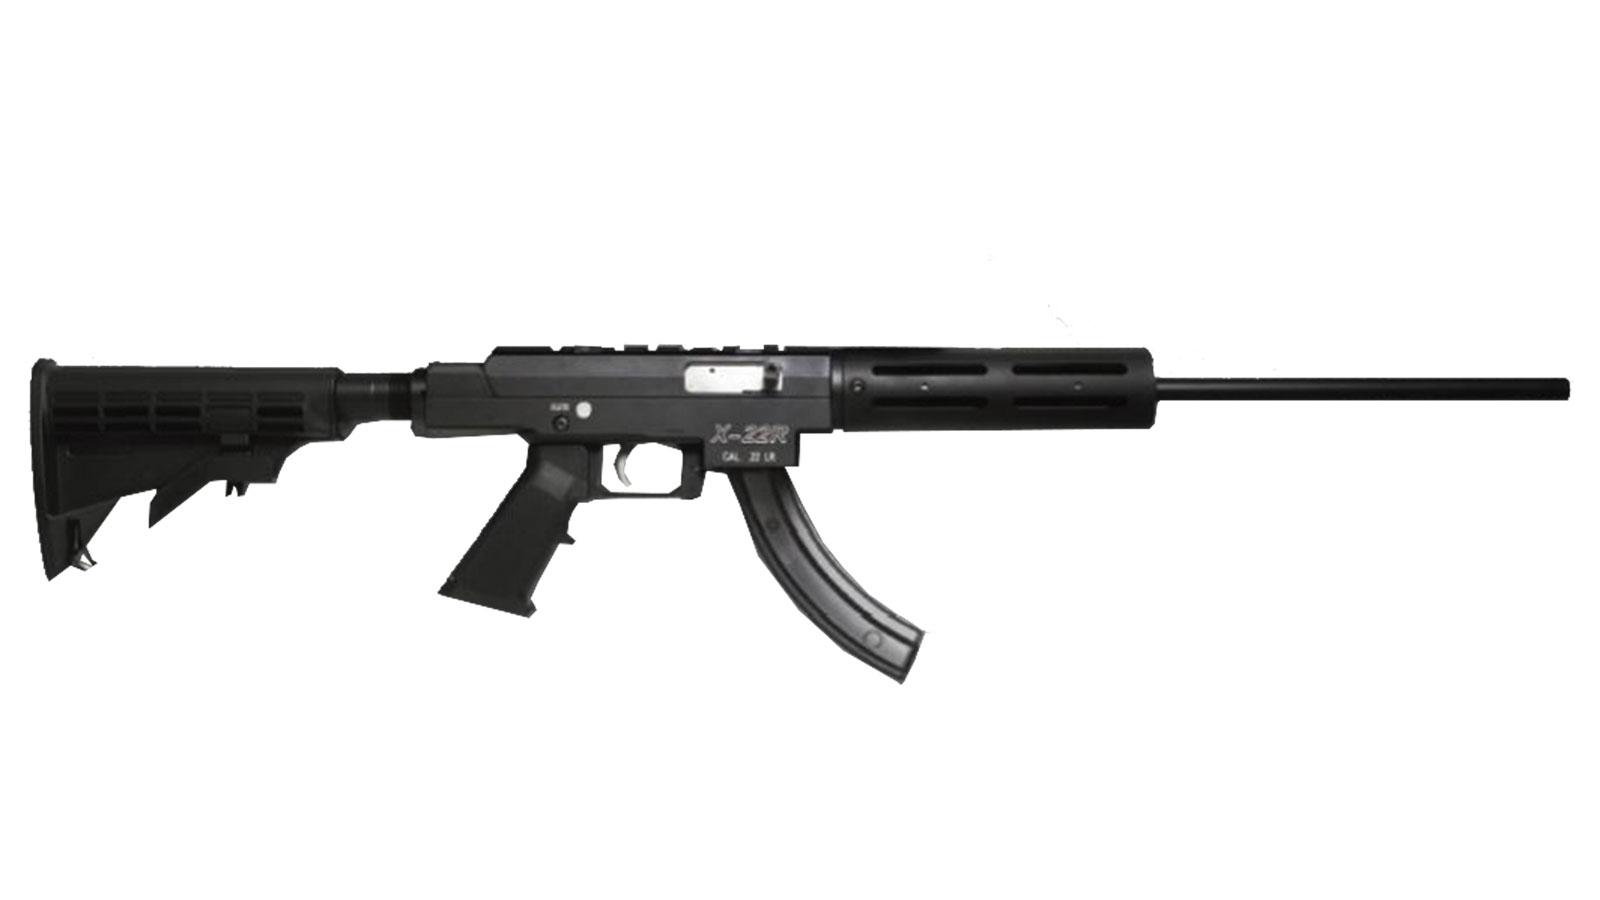 Excel Industries X-22R 22 LR Rifle 18 inch 25rd